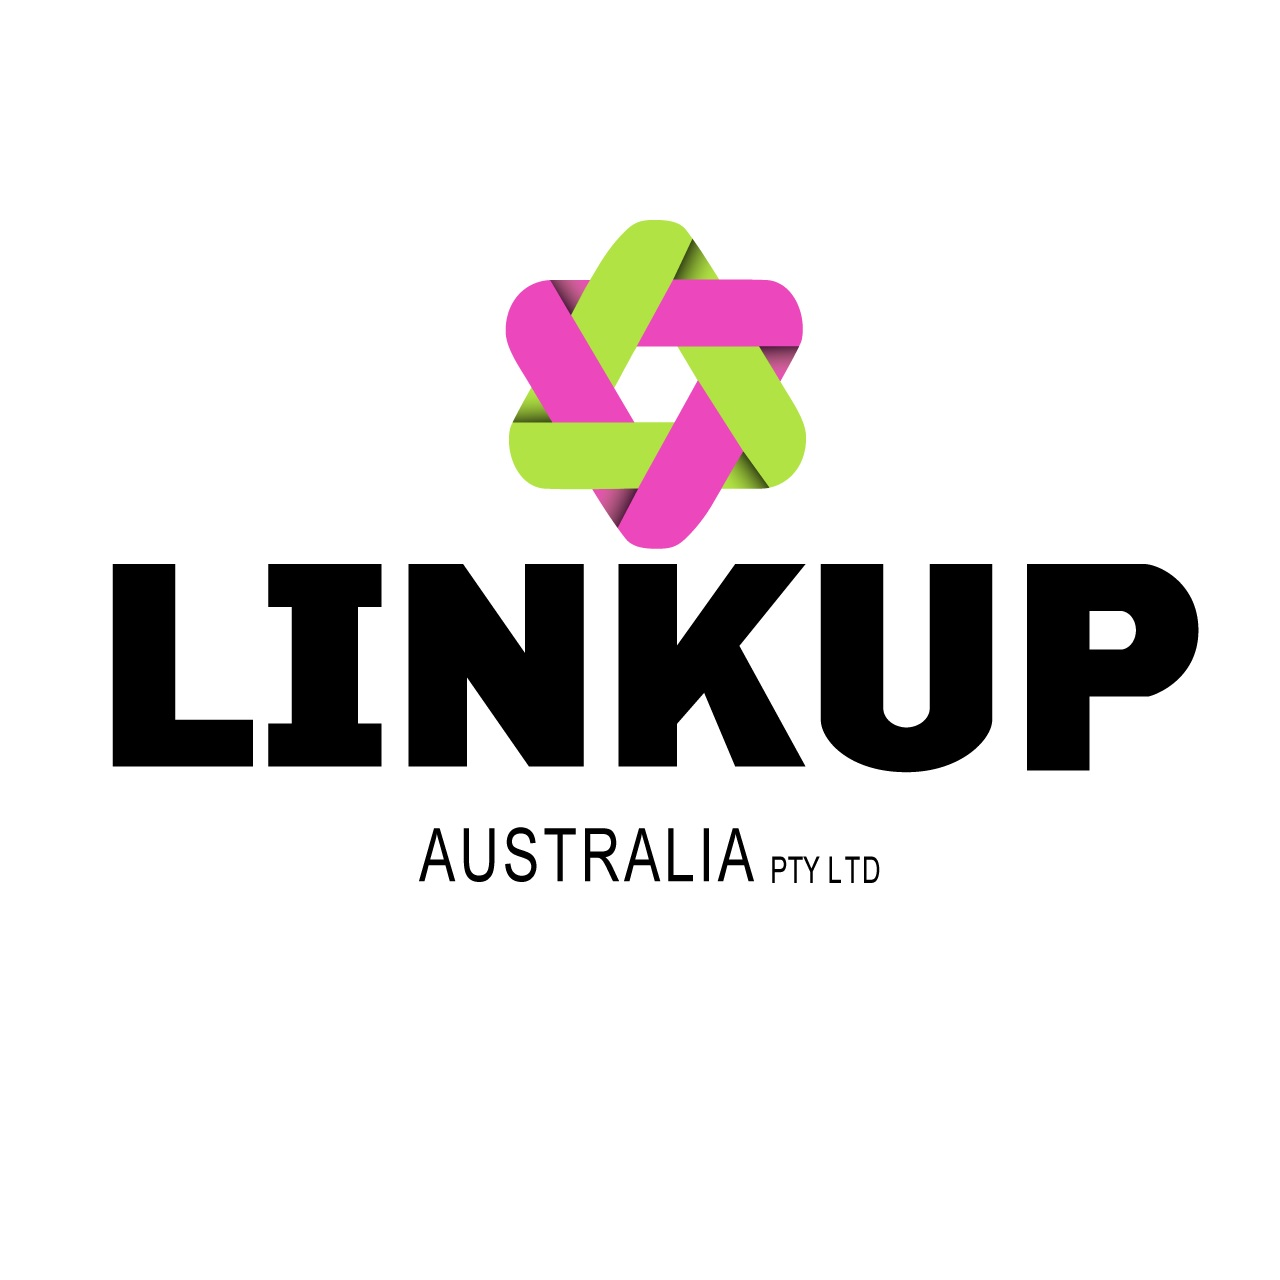 Linkup Australia